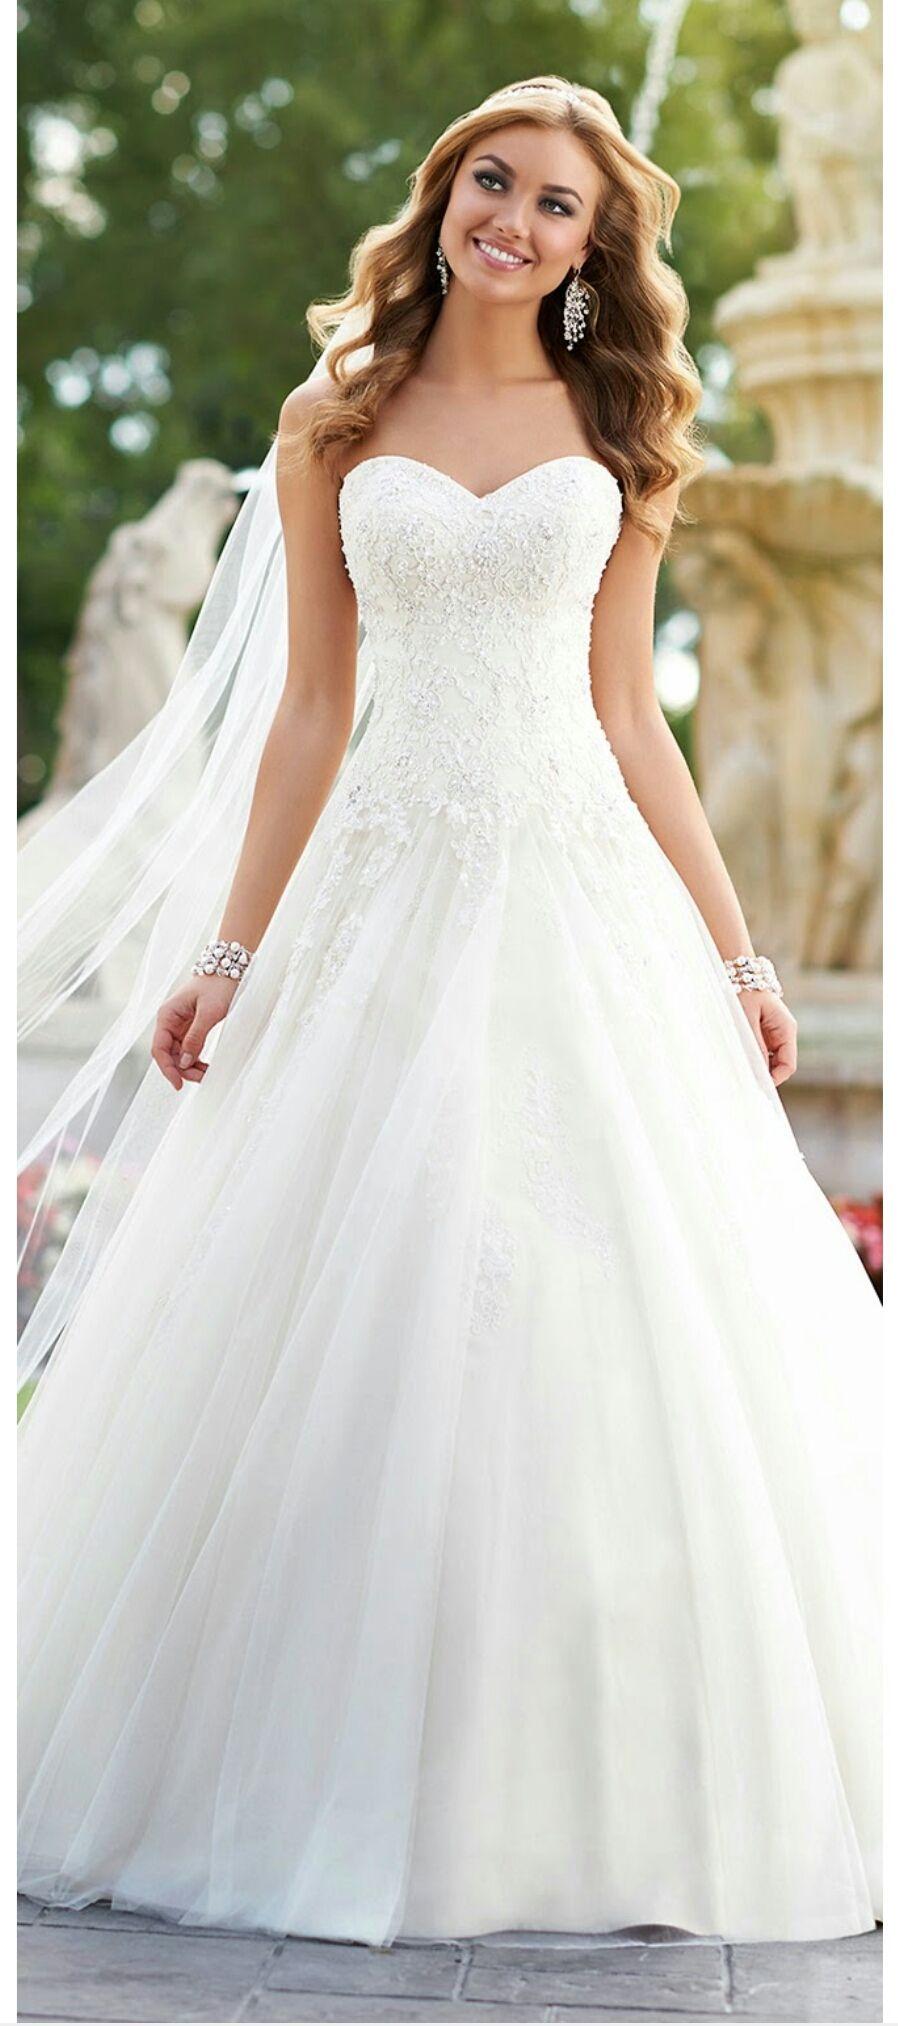 Vintage country wedding dresses  Dream dress Details and shape Love  Love My Favorite  letter